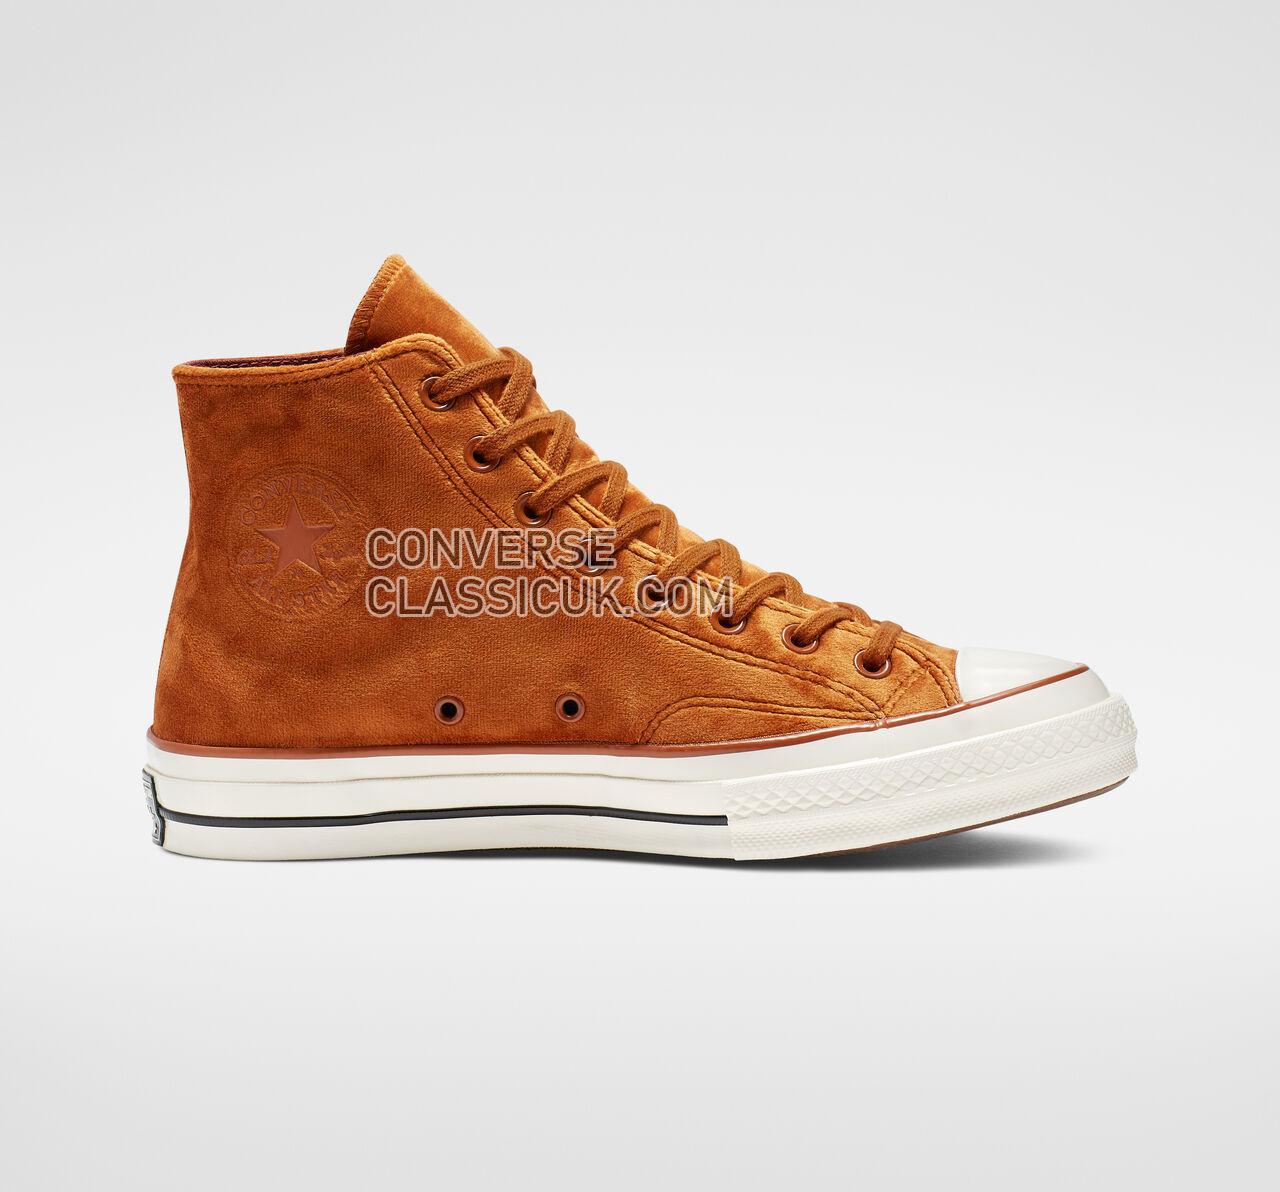 Converse Chuck 70 Velvet High Top Mens Womens Unisex 165171C Burnt Sienna/Burnt Sienna Shoes